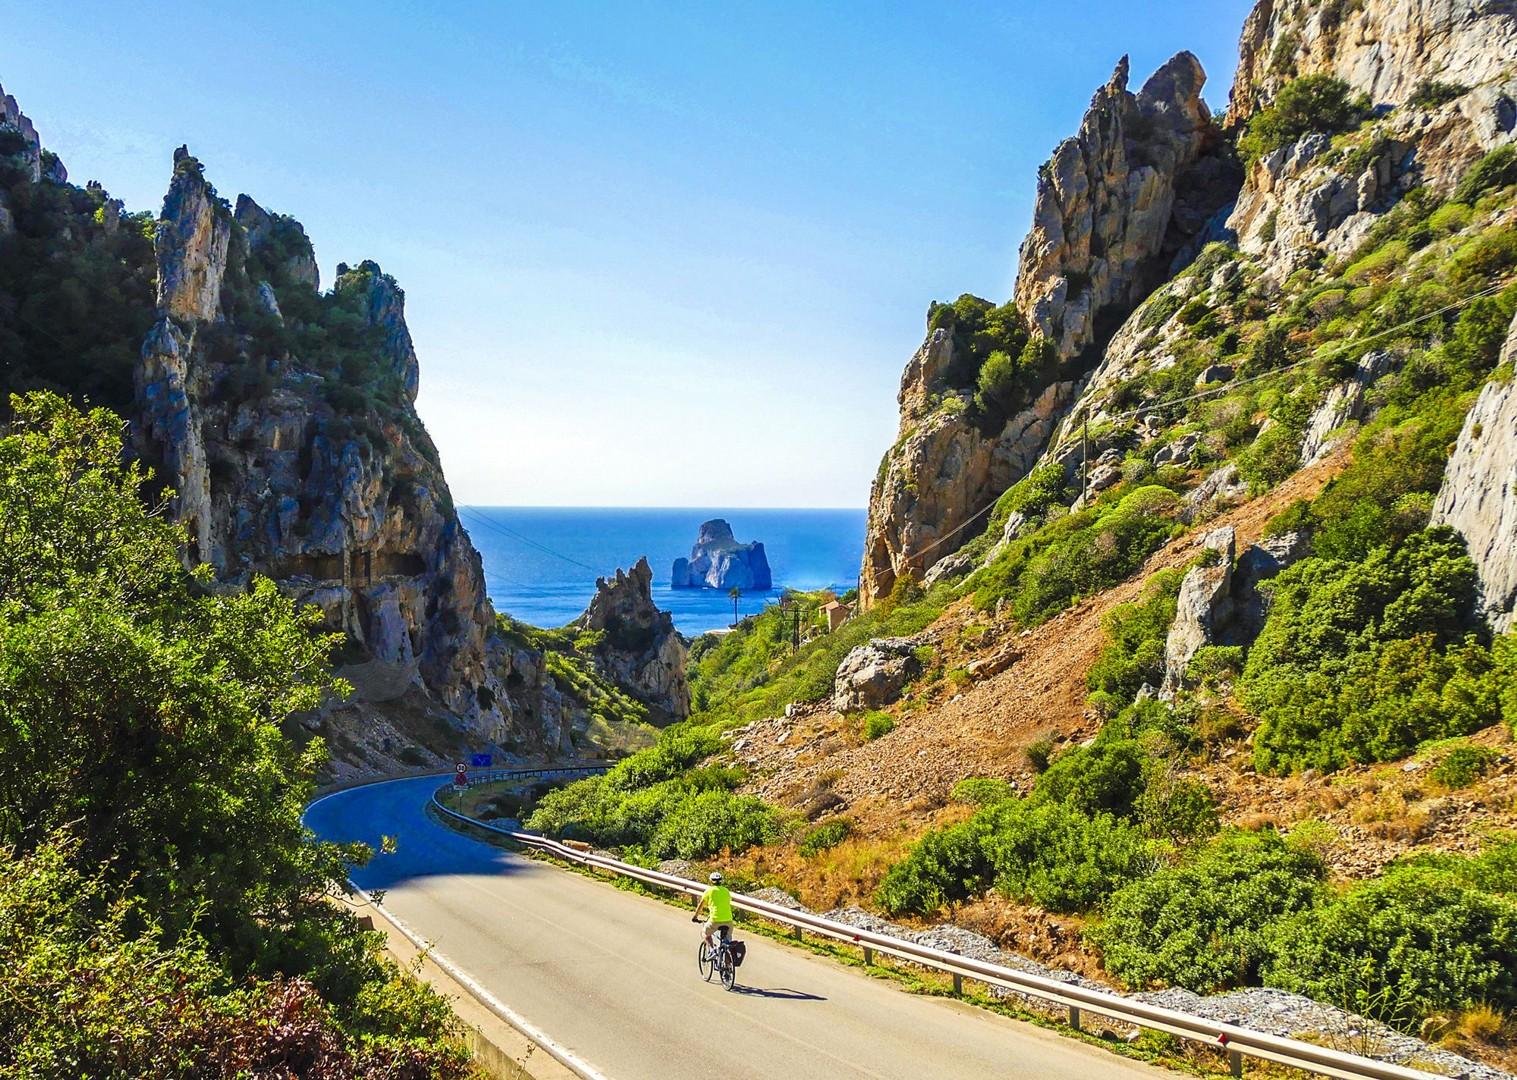 Descending towards the Pan di Zucchero2 - leisure cycling-2.jpg - Italy - Sardinia - Island Flavours - Self-Guided Leisure Cycling Holiday - Italia Leisure and Family Cycling